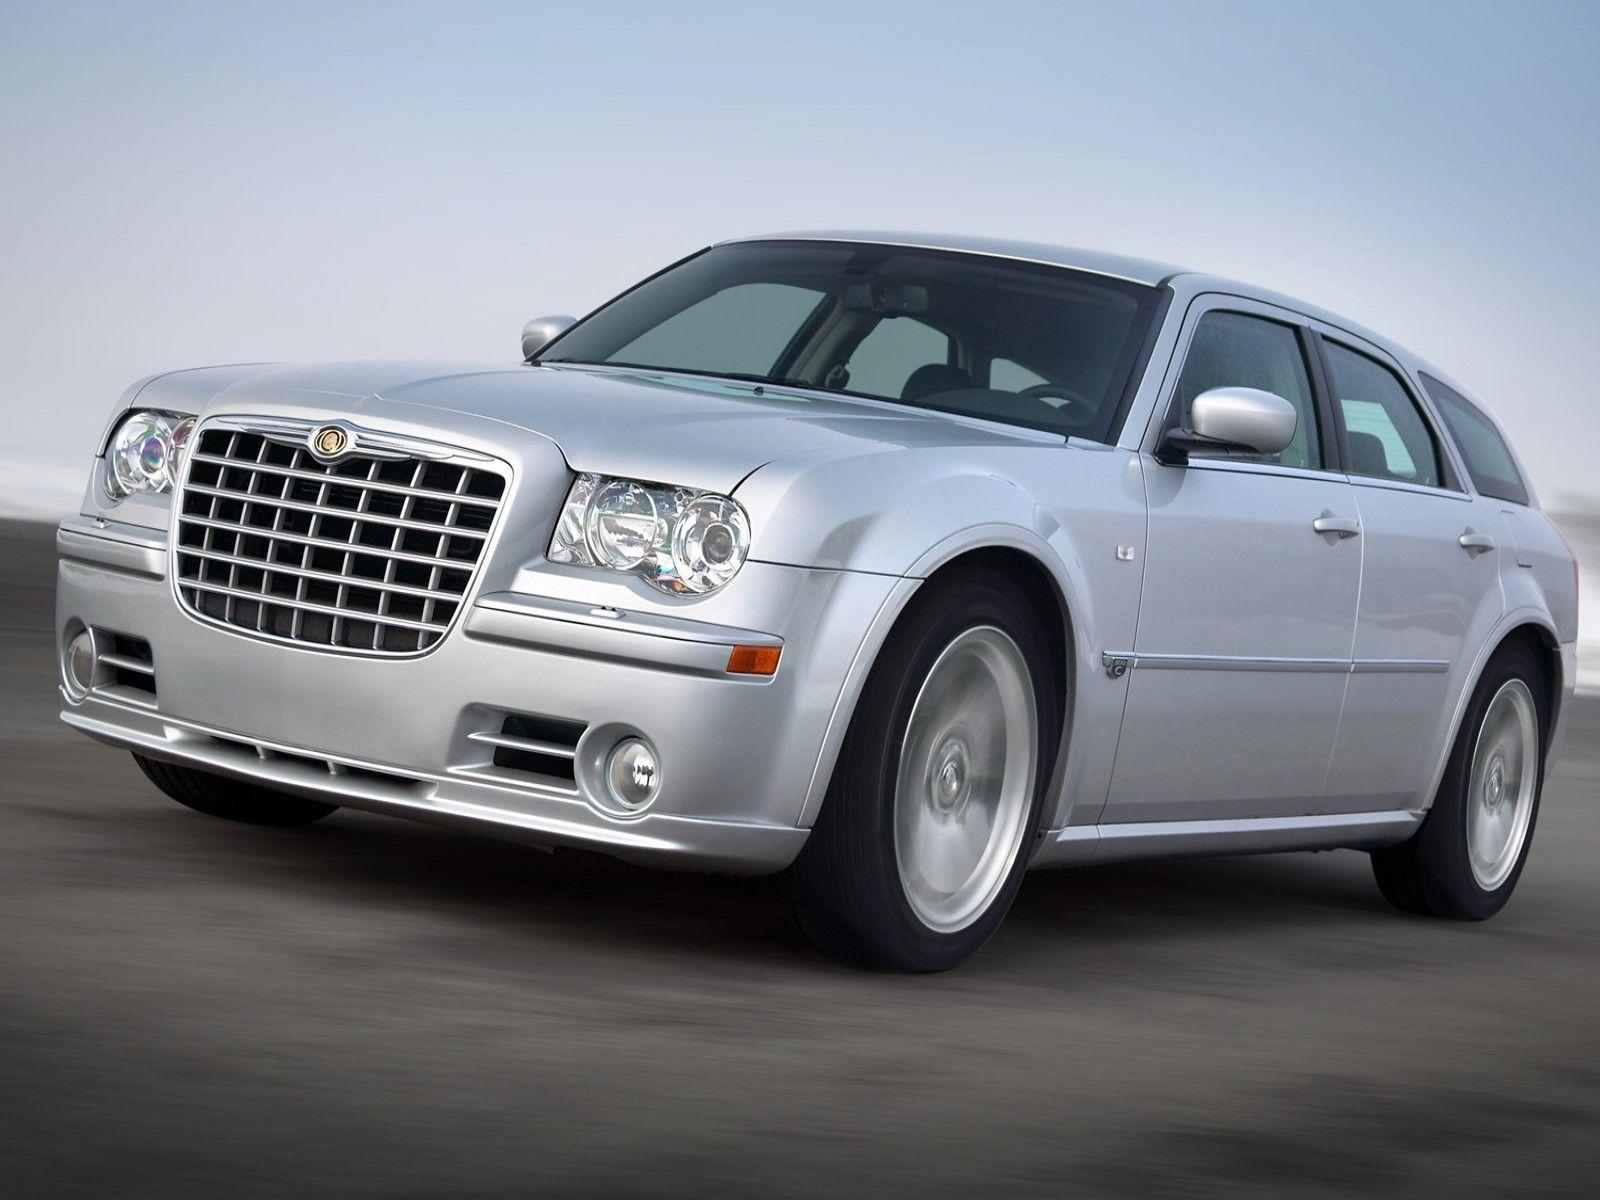 Chrysler 300c touring srt8 wagon